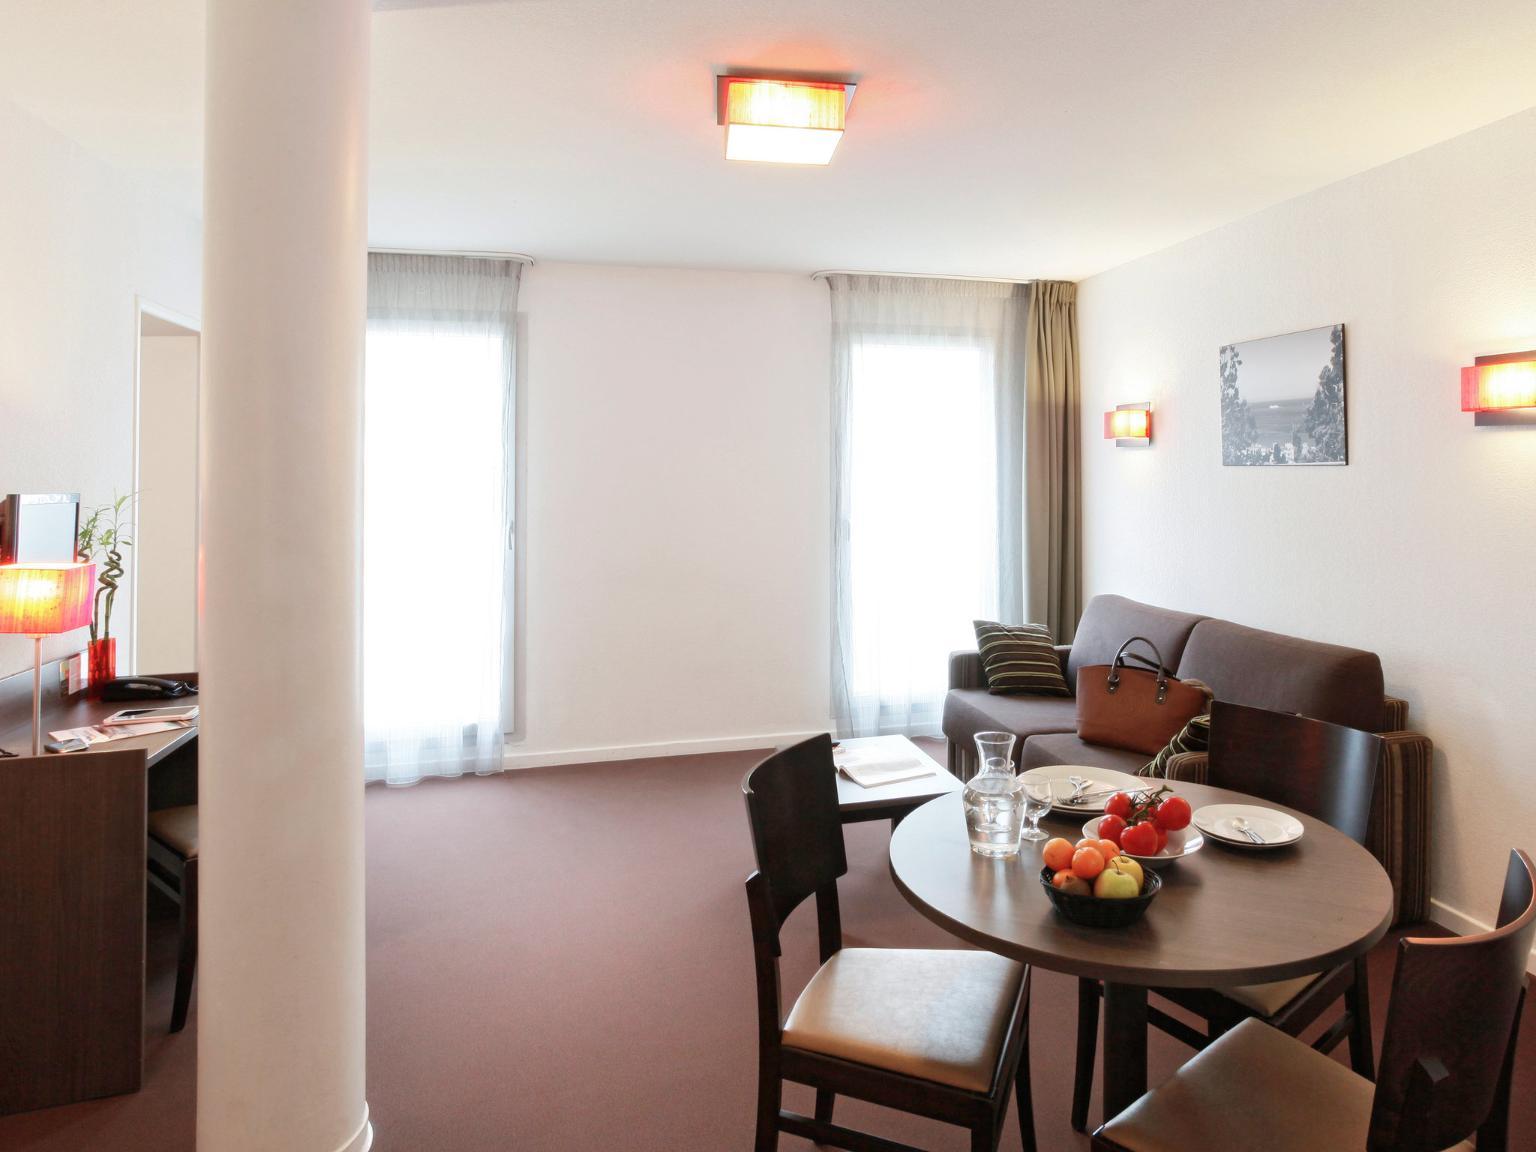 Aparthotel adagio access marseille saint charles h tel for Appart hotel 13003